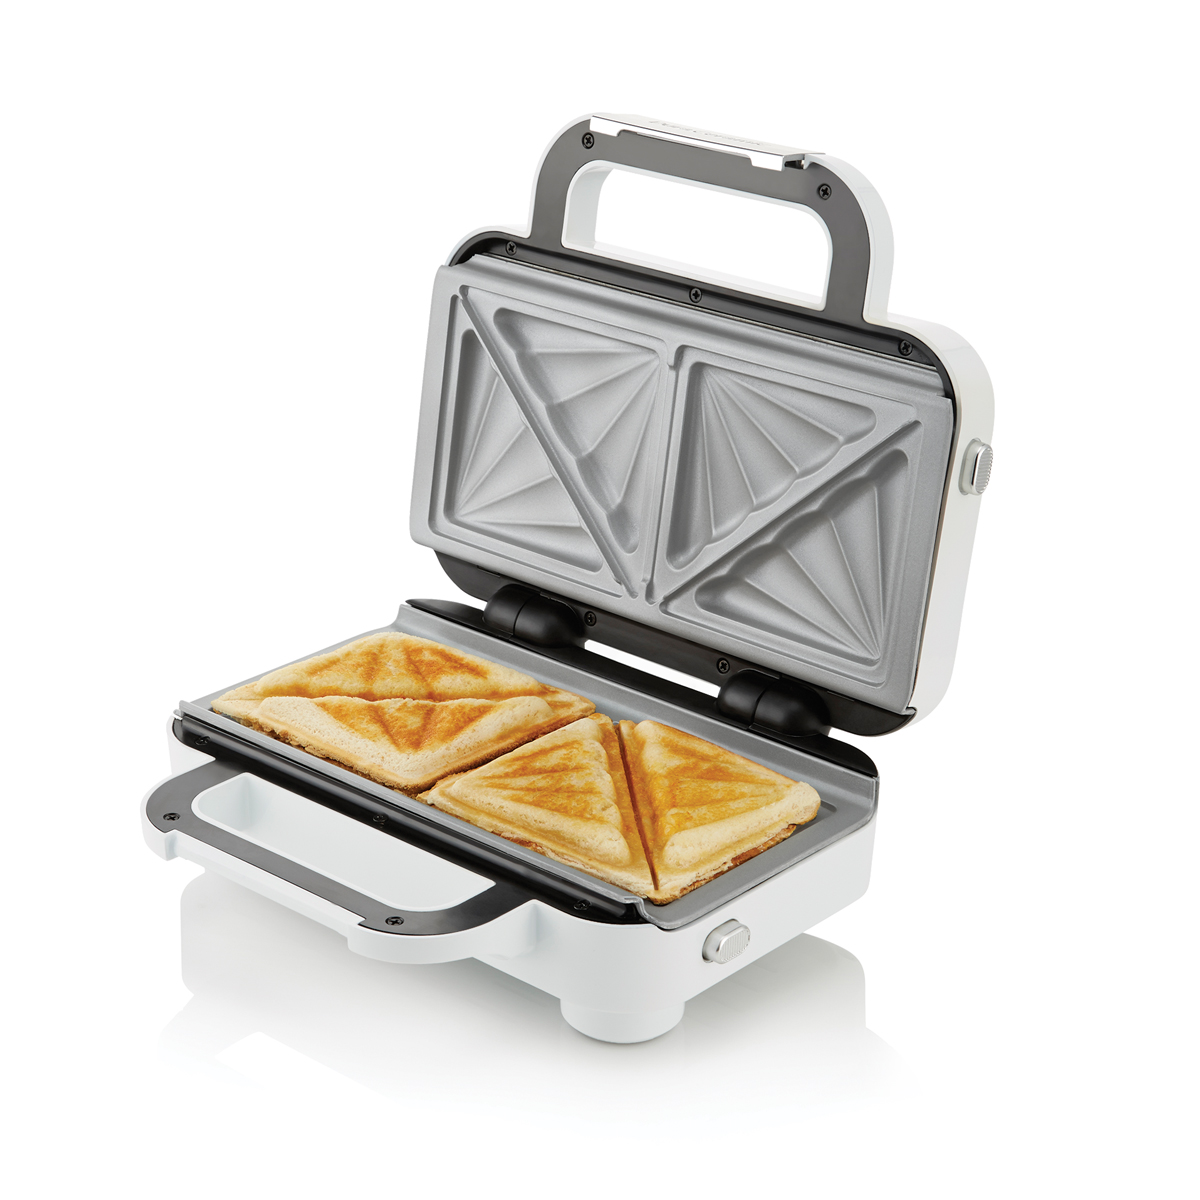 Breville High Gloss DuraCeramic™ Sandwich Toaster